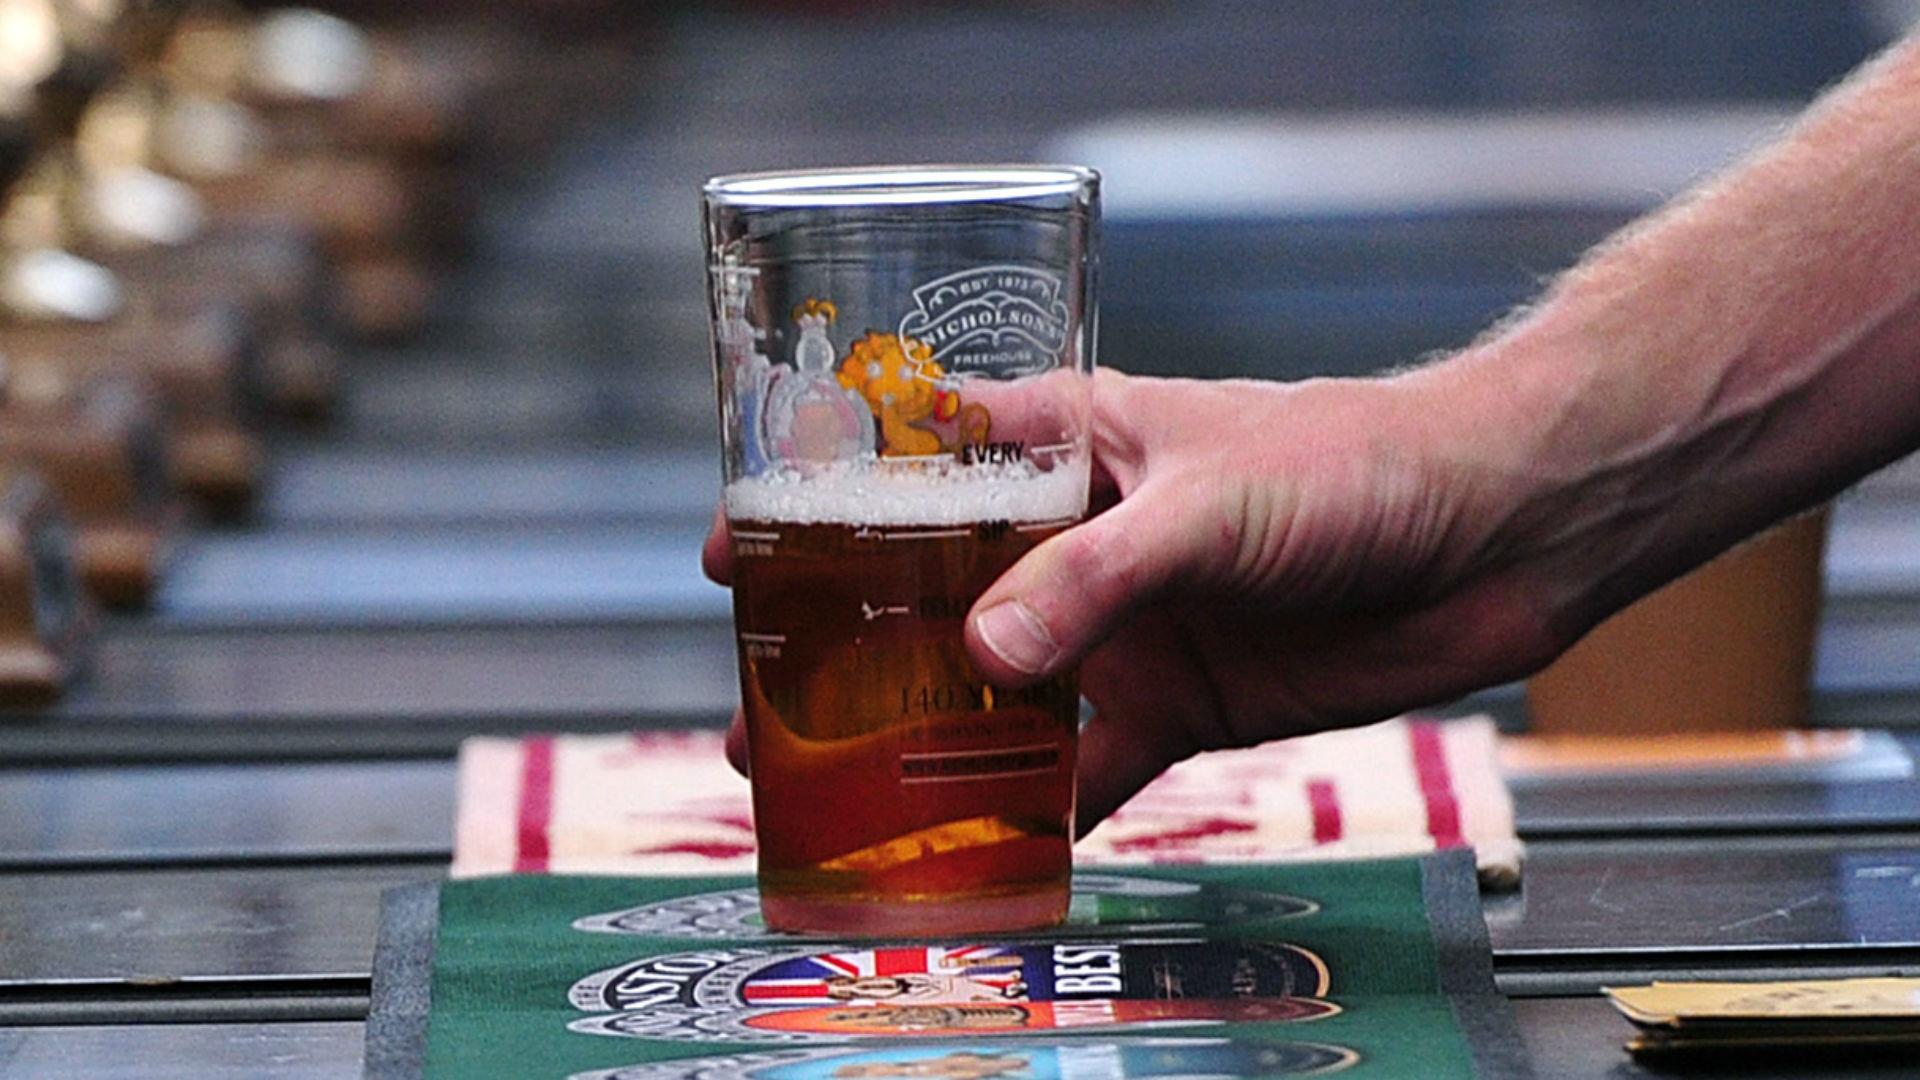 Beer-91917-usnews-getty-ftr_1h1bjtkm72fyg1qw1pux6lycha